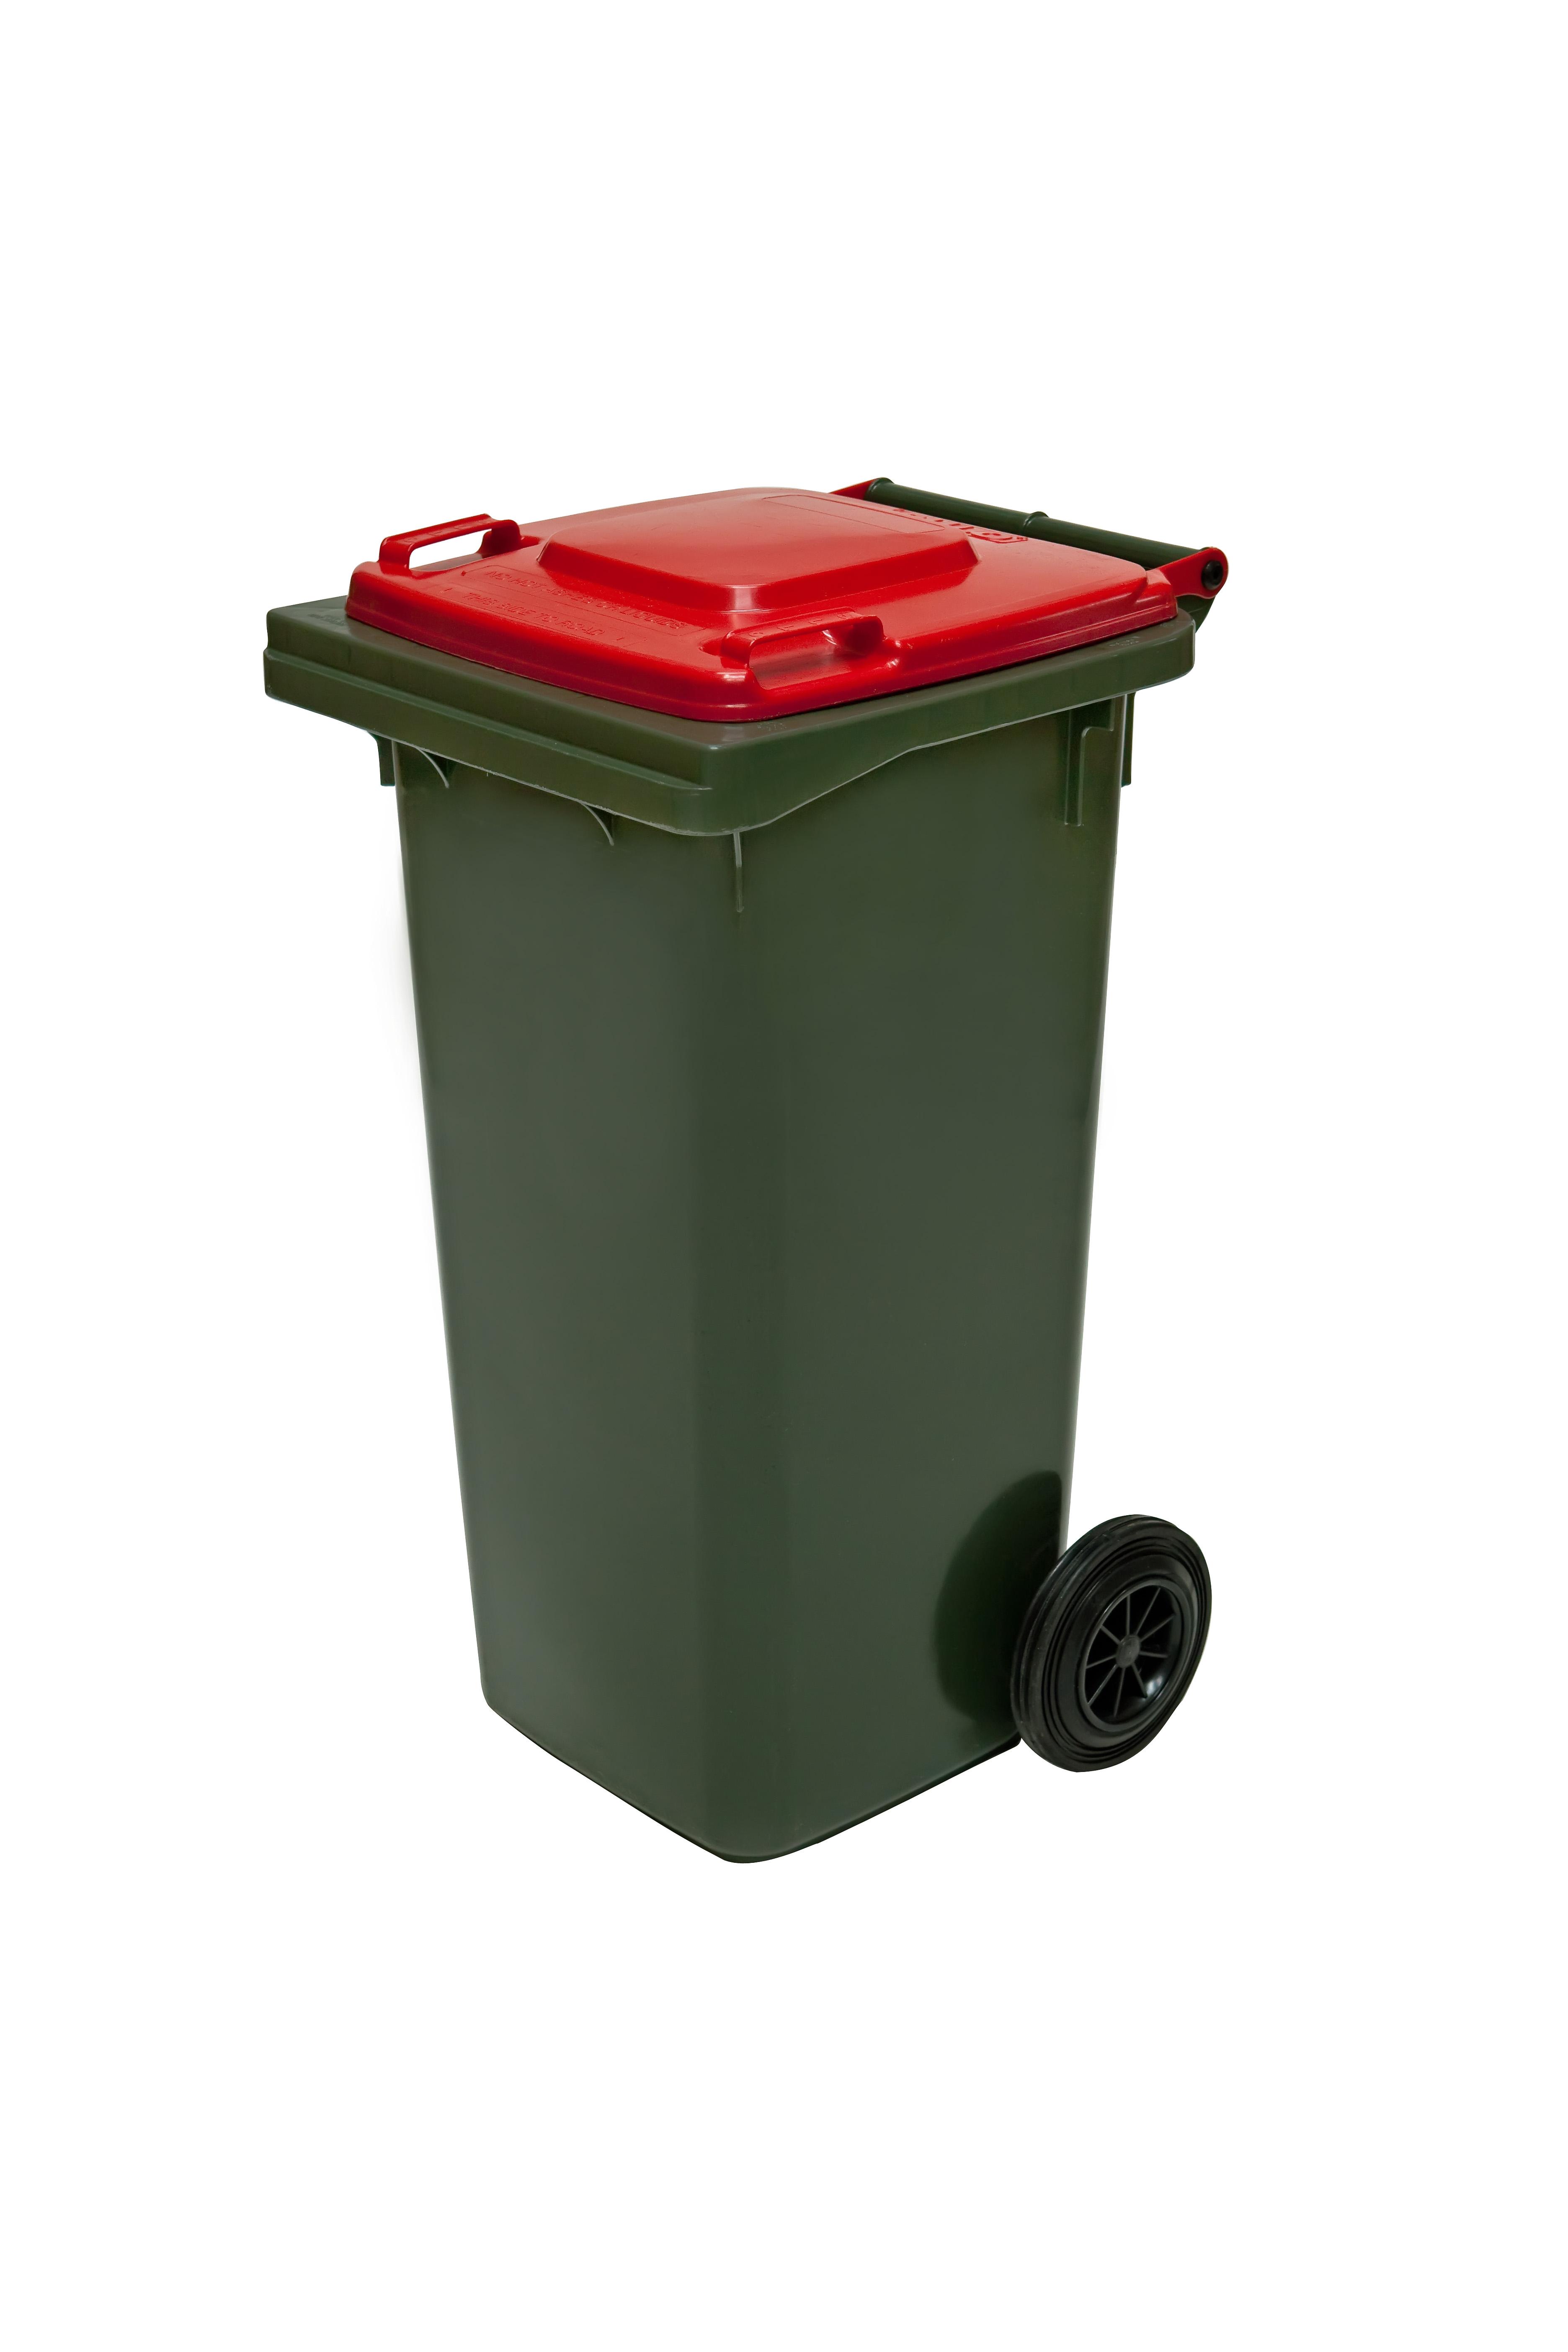 Image gallery rubbish bin - Rd rubbish bin ...